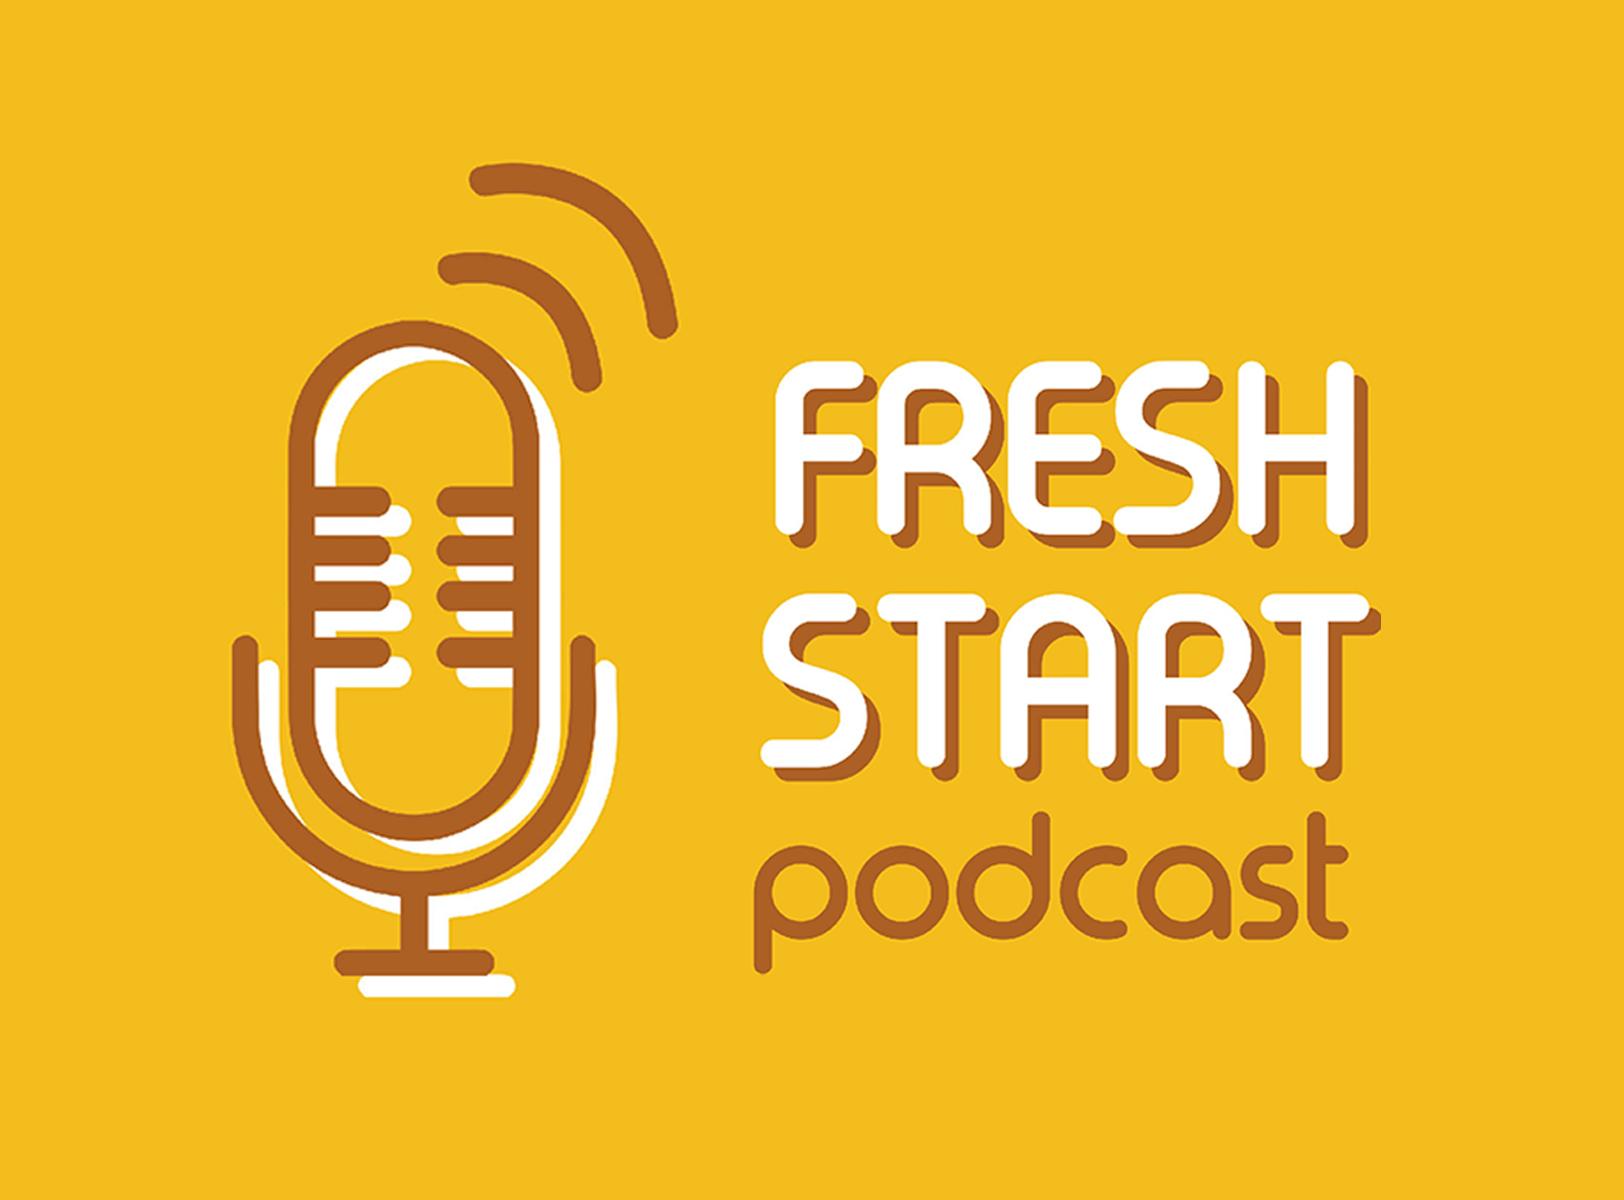 Fresh Start: Podcast News (4/1/2019 Mon.)